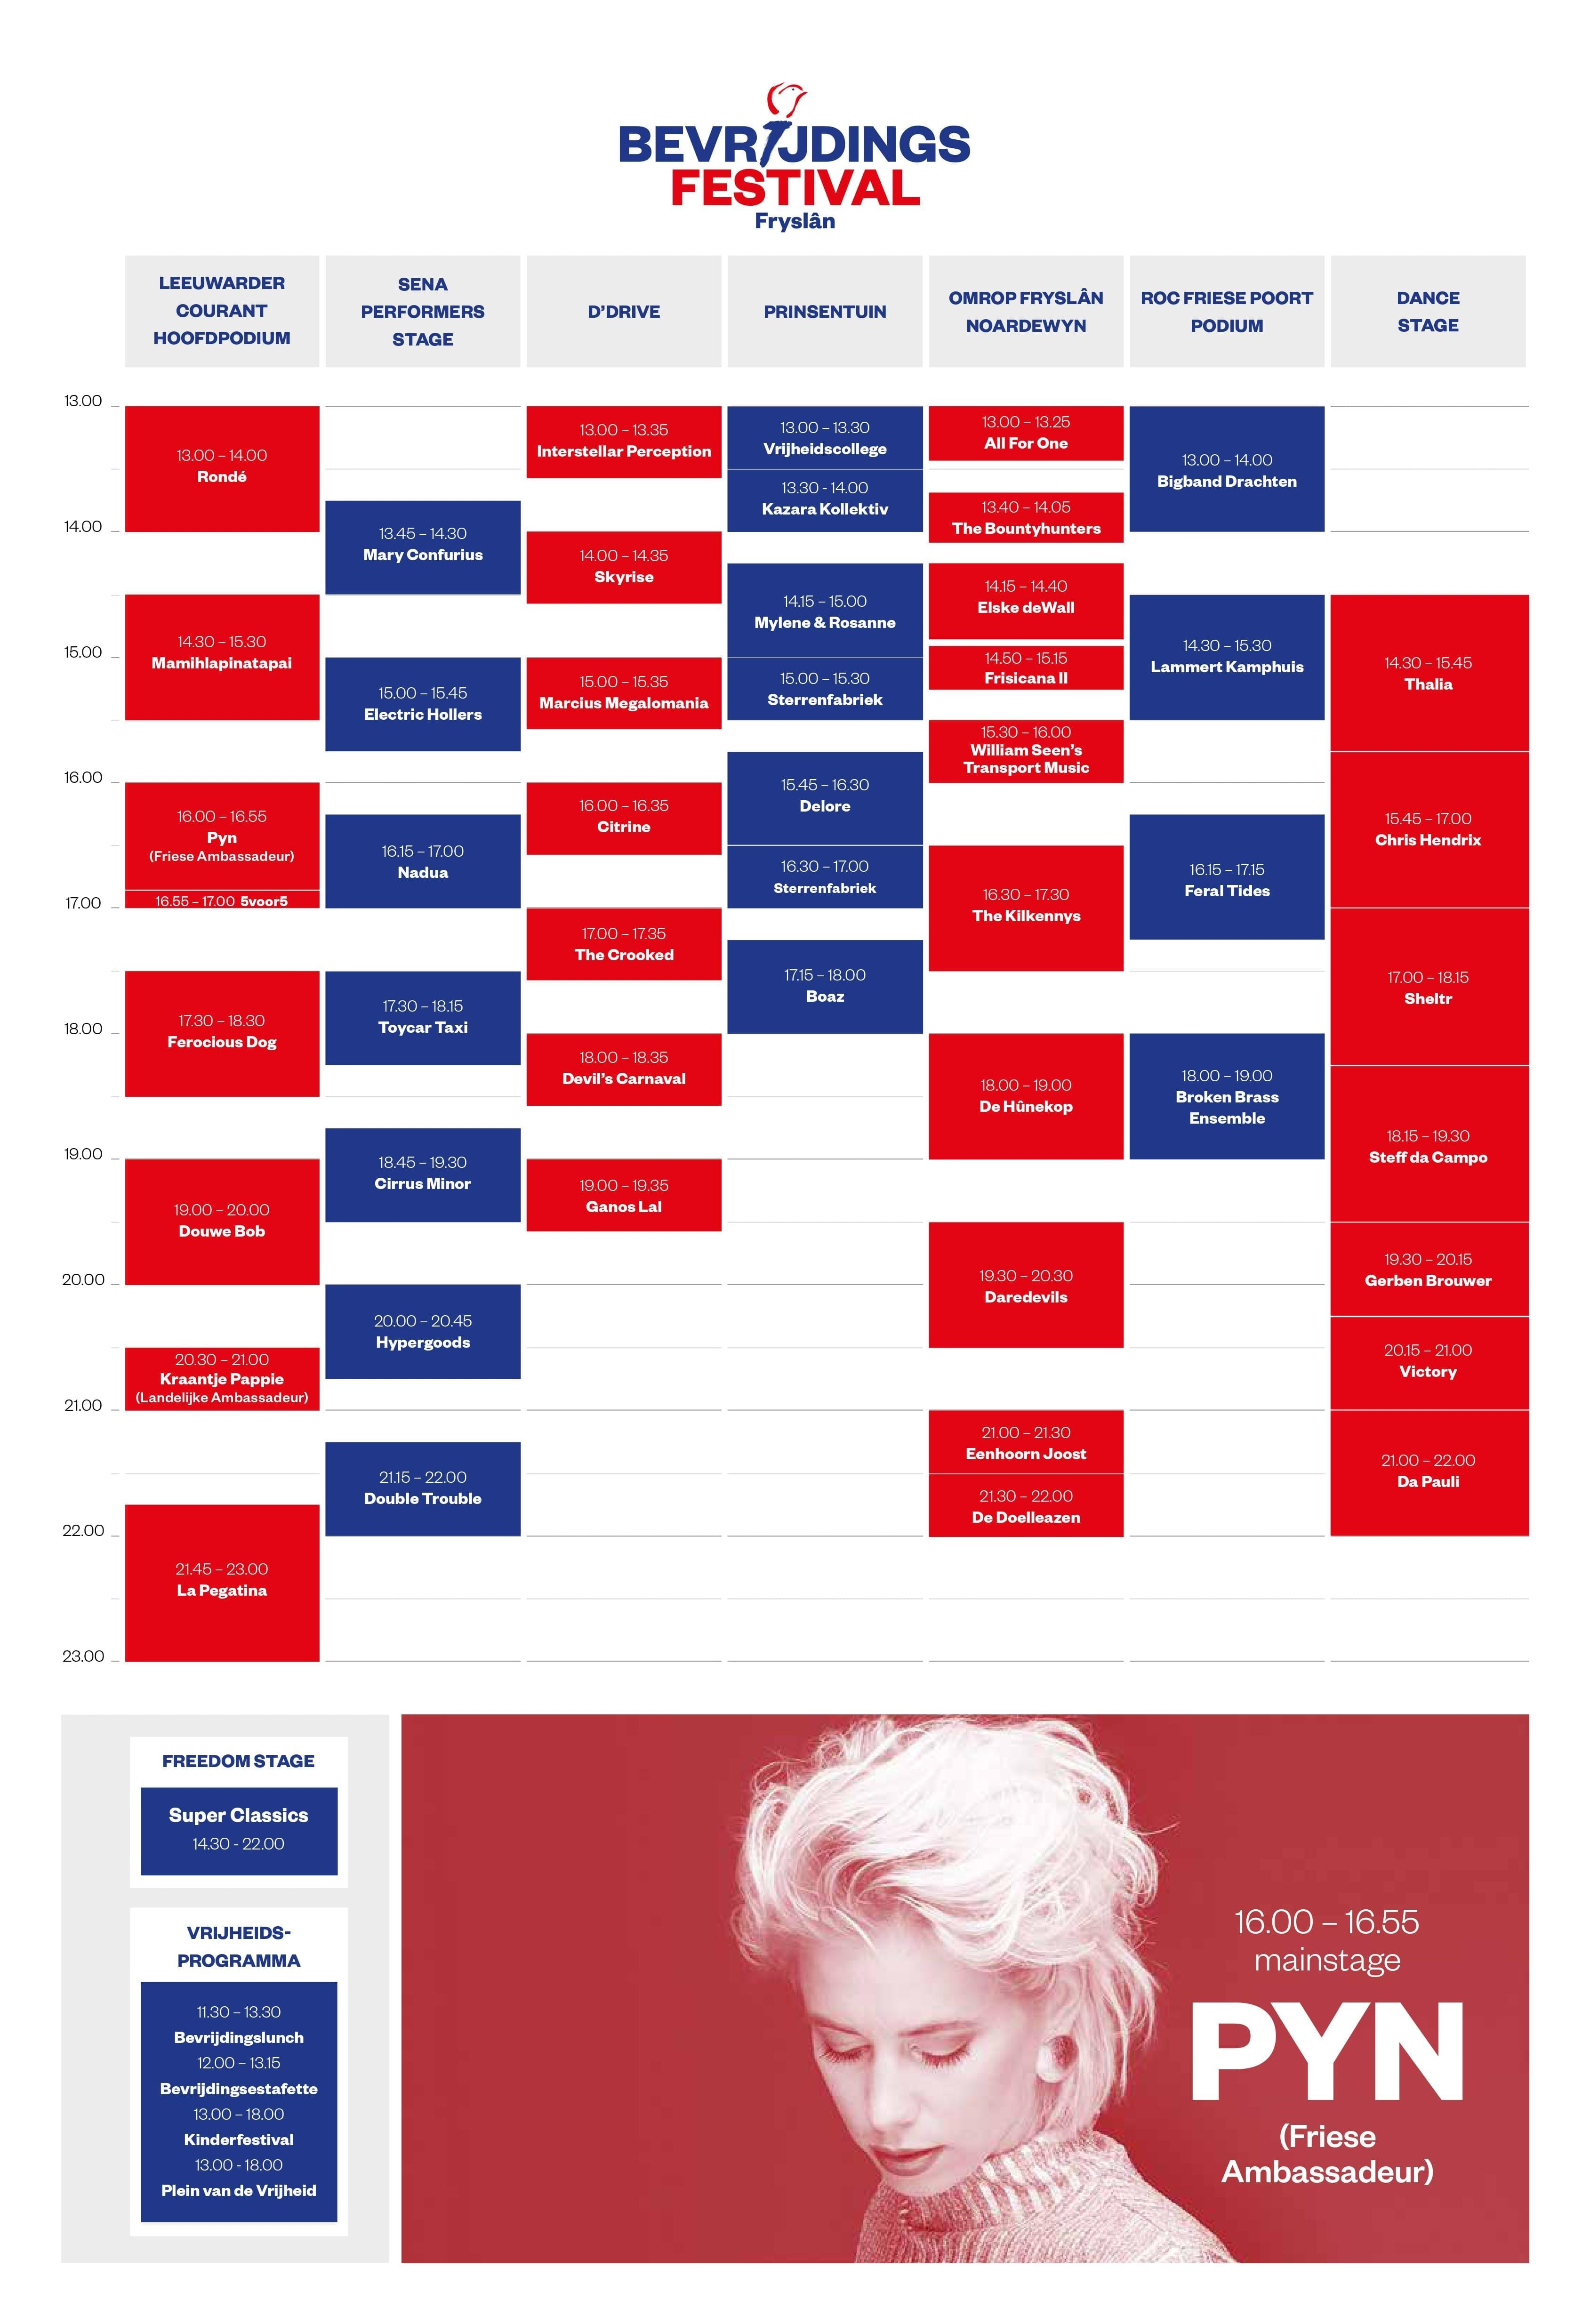 blokkenschema bevrijdingsfestival fryslan